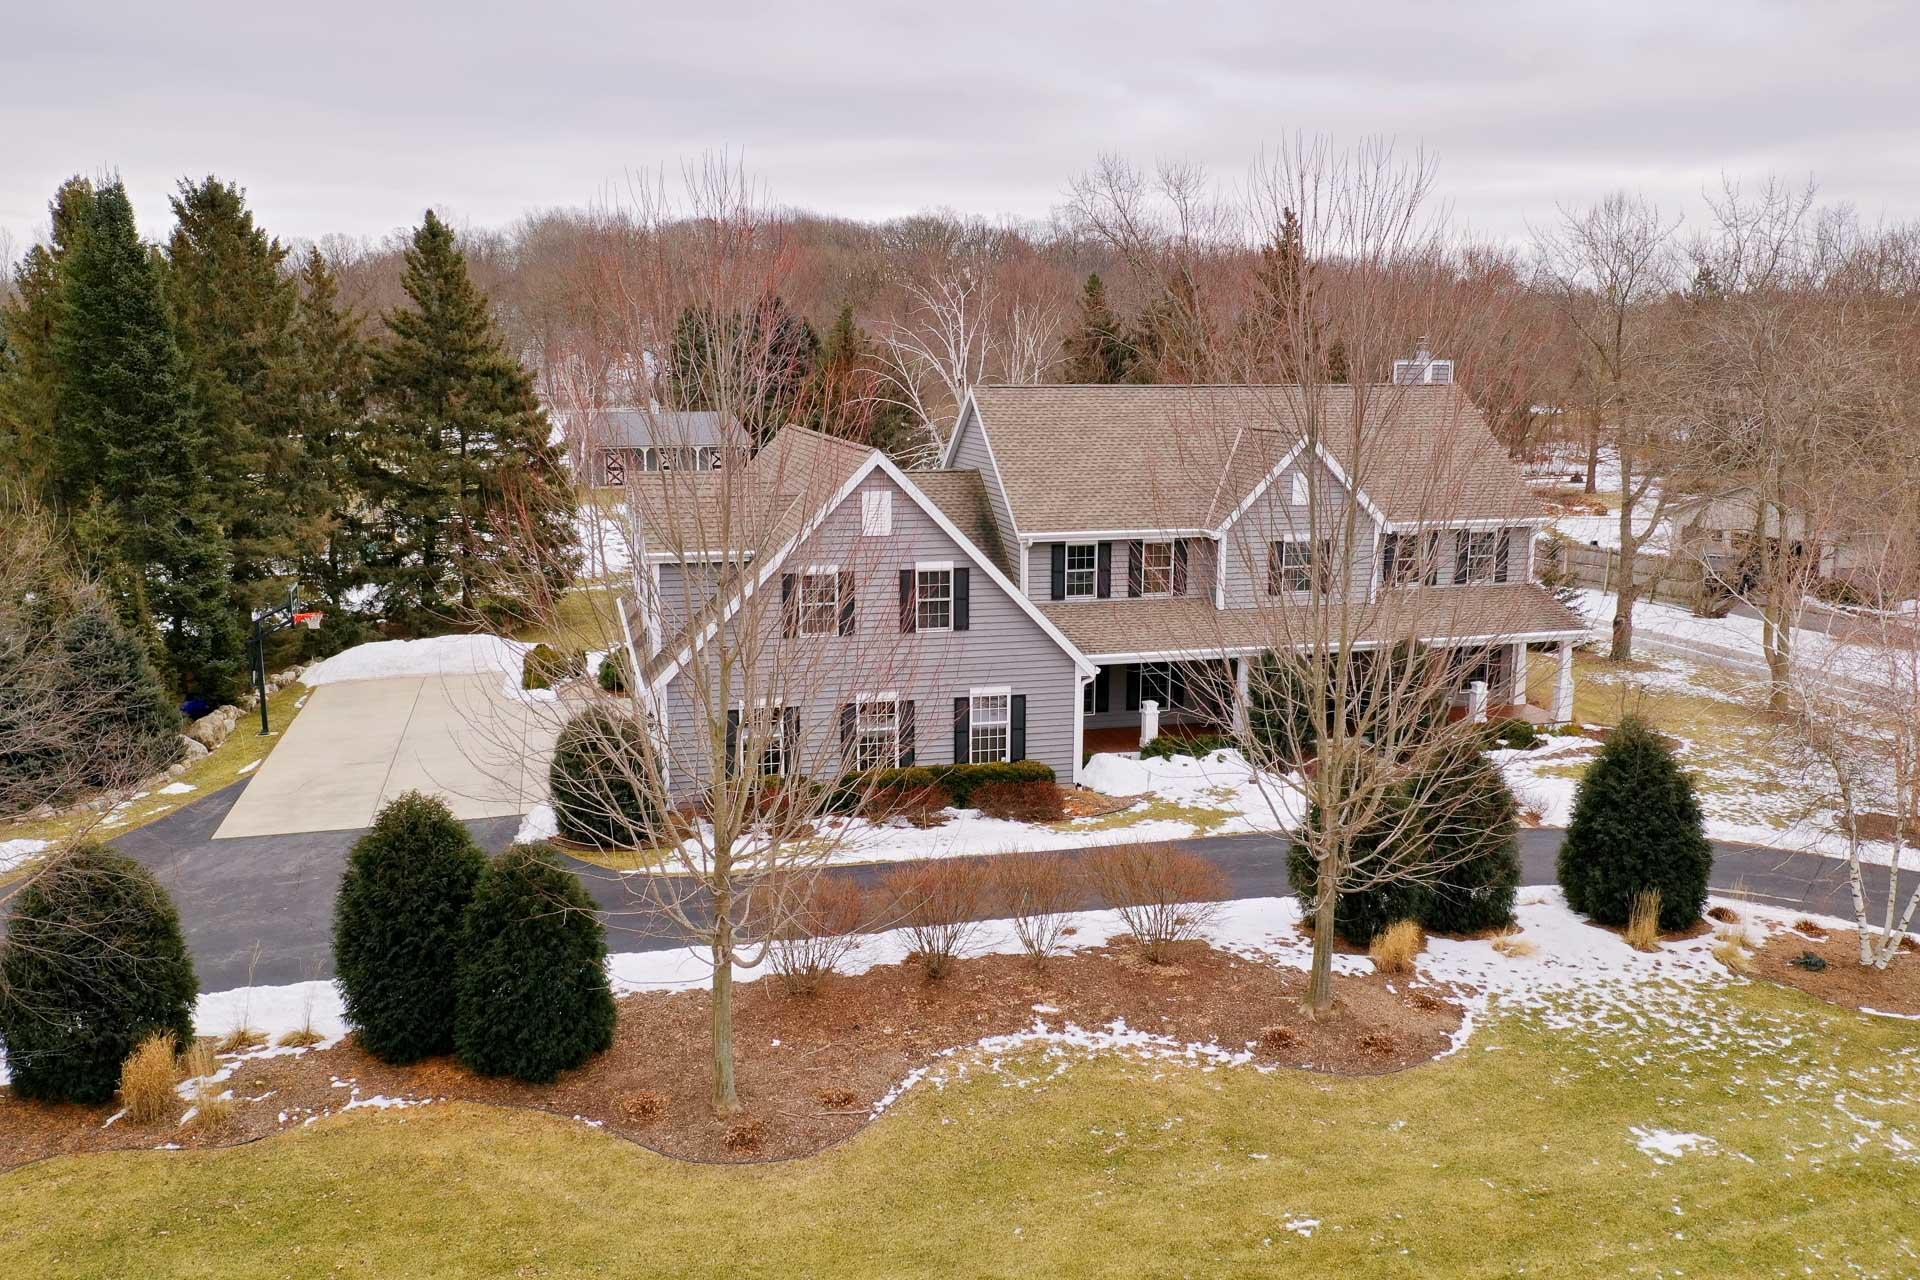 2520 Nagawicka Rd, Delafield, Wisconsin 53029, 4 Bedrooms Bedrooms, 15 Rooms Rooms,4 BathroomsBathrooms,Single-Family,For Sale,Nagawicka Rd,1621785